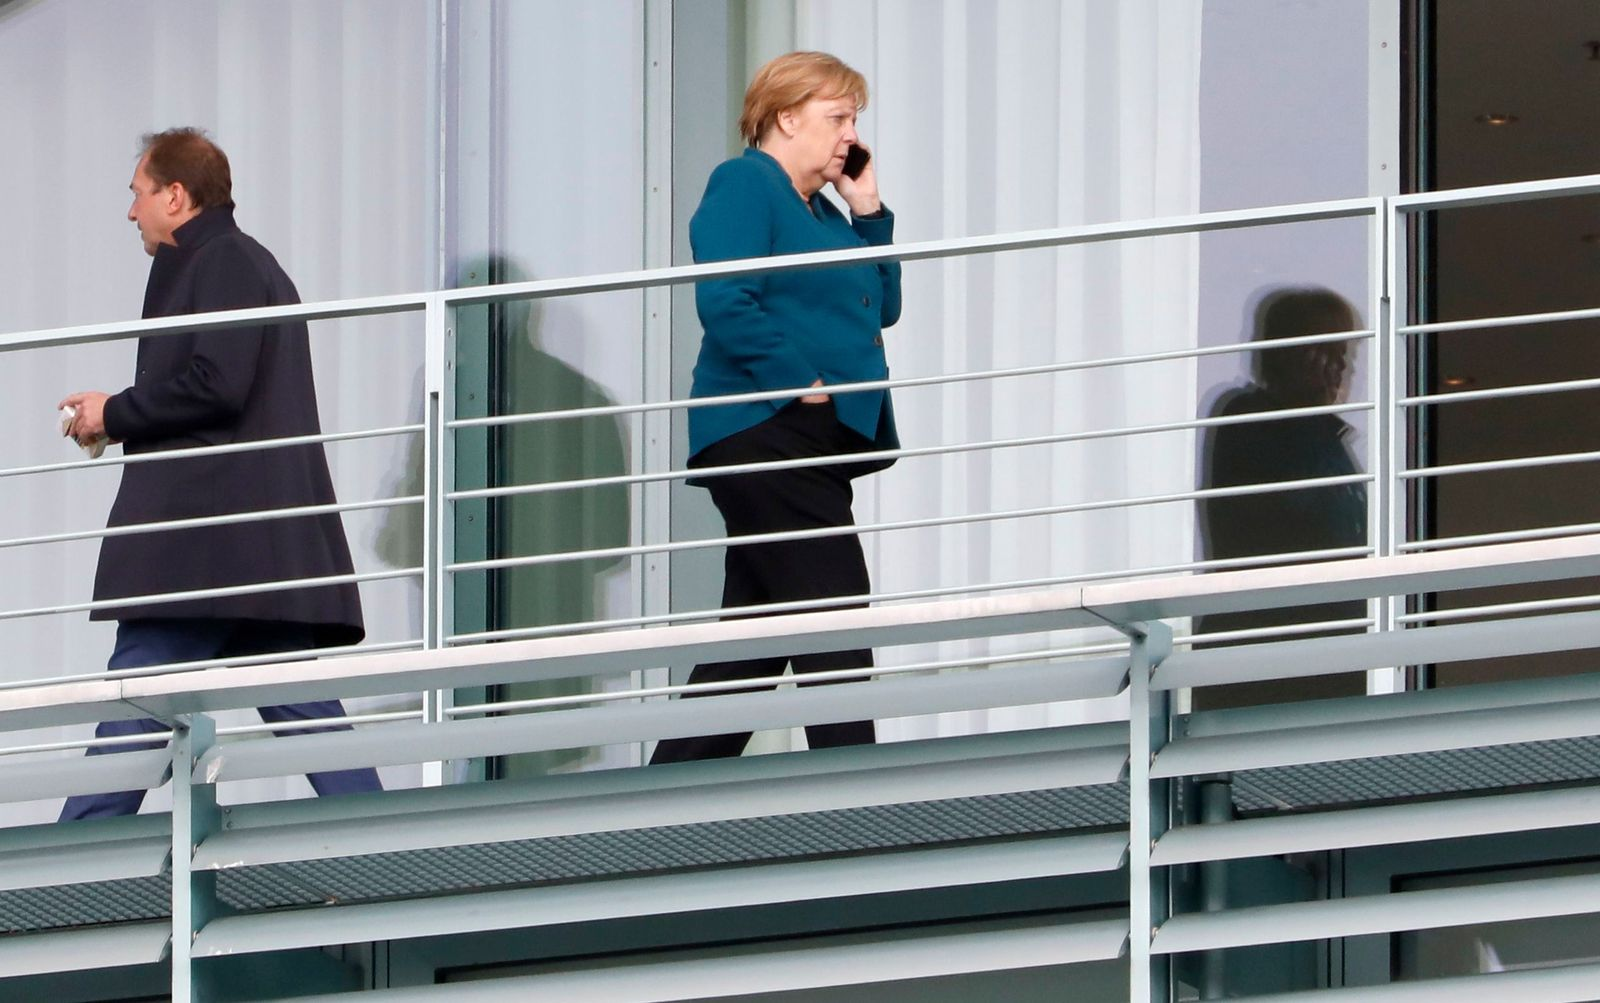 Coalition meeting in Berlin, Germany - 20 Sep 2019